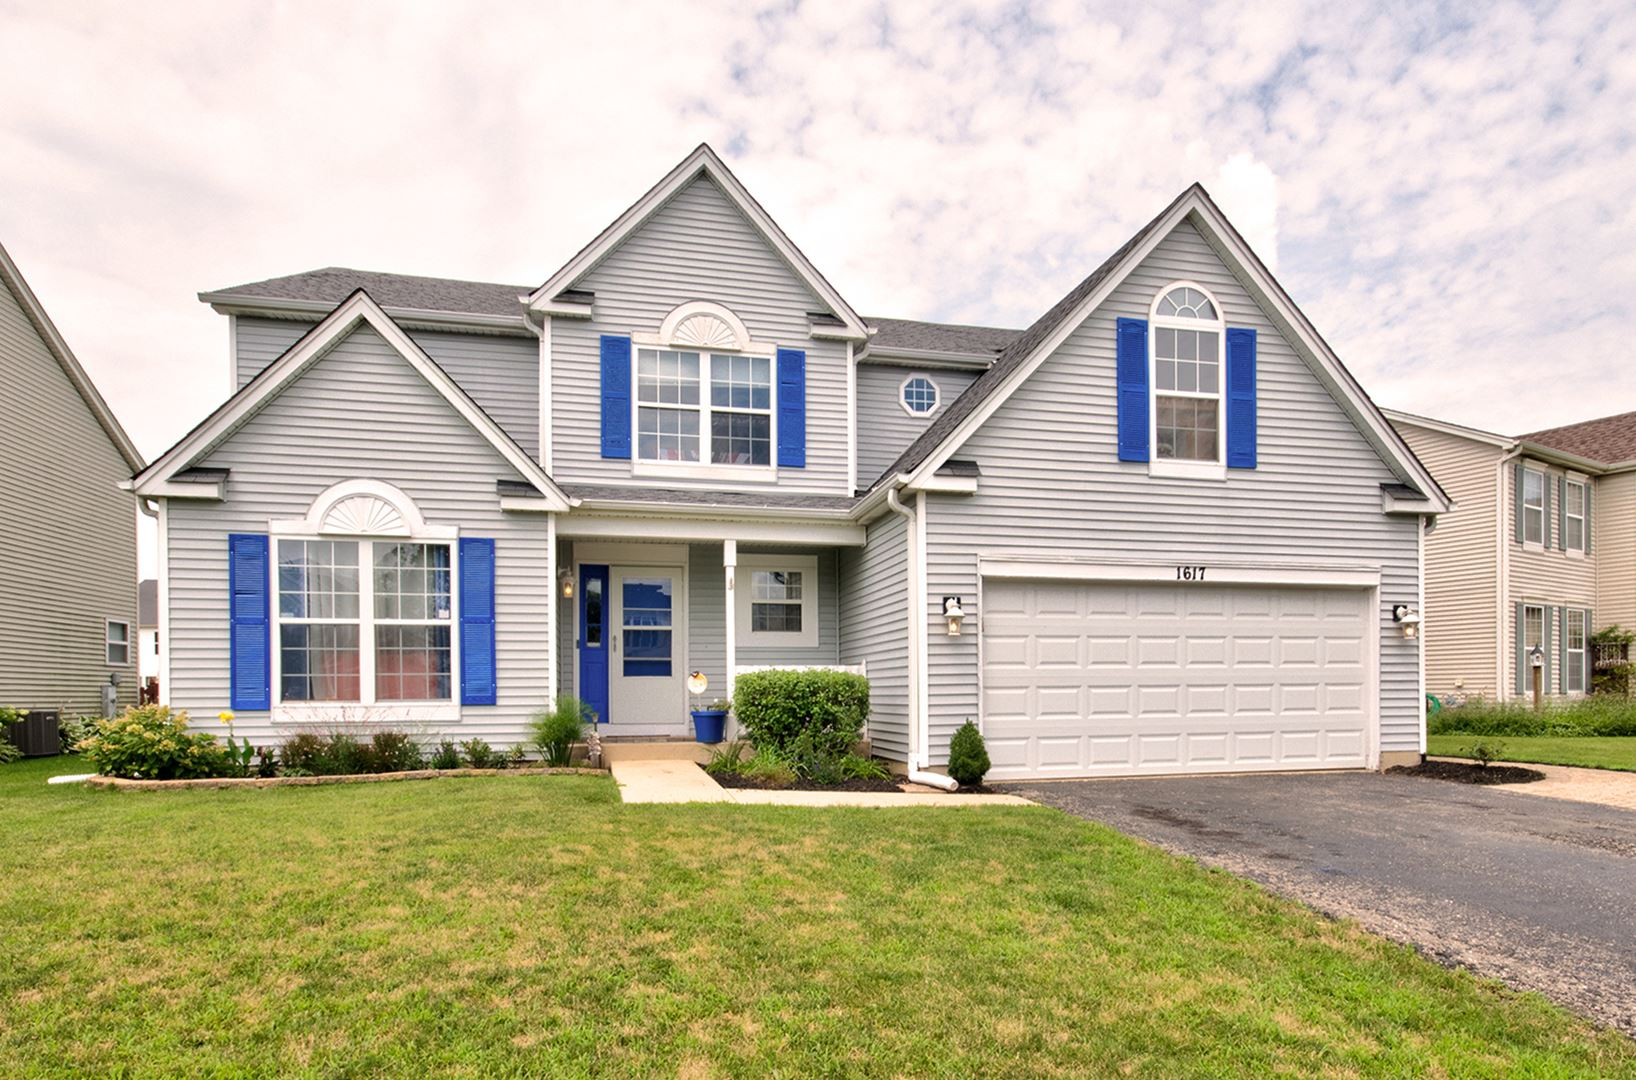 1617 Grand Highlands Drive, Plainfield, IL 60586 - #: 10803806